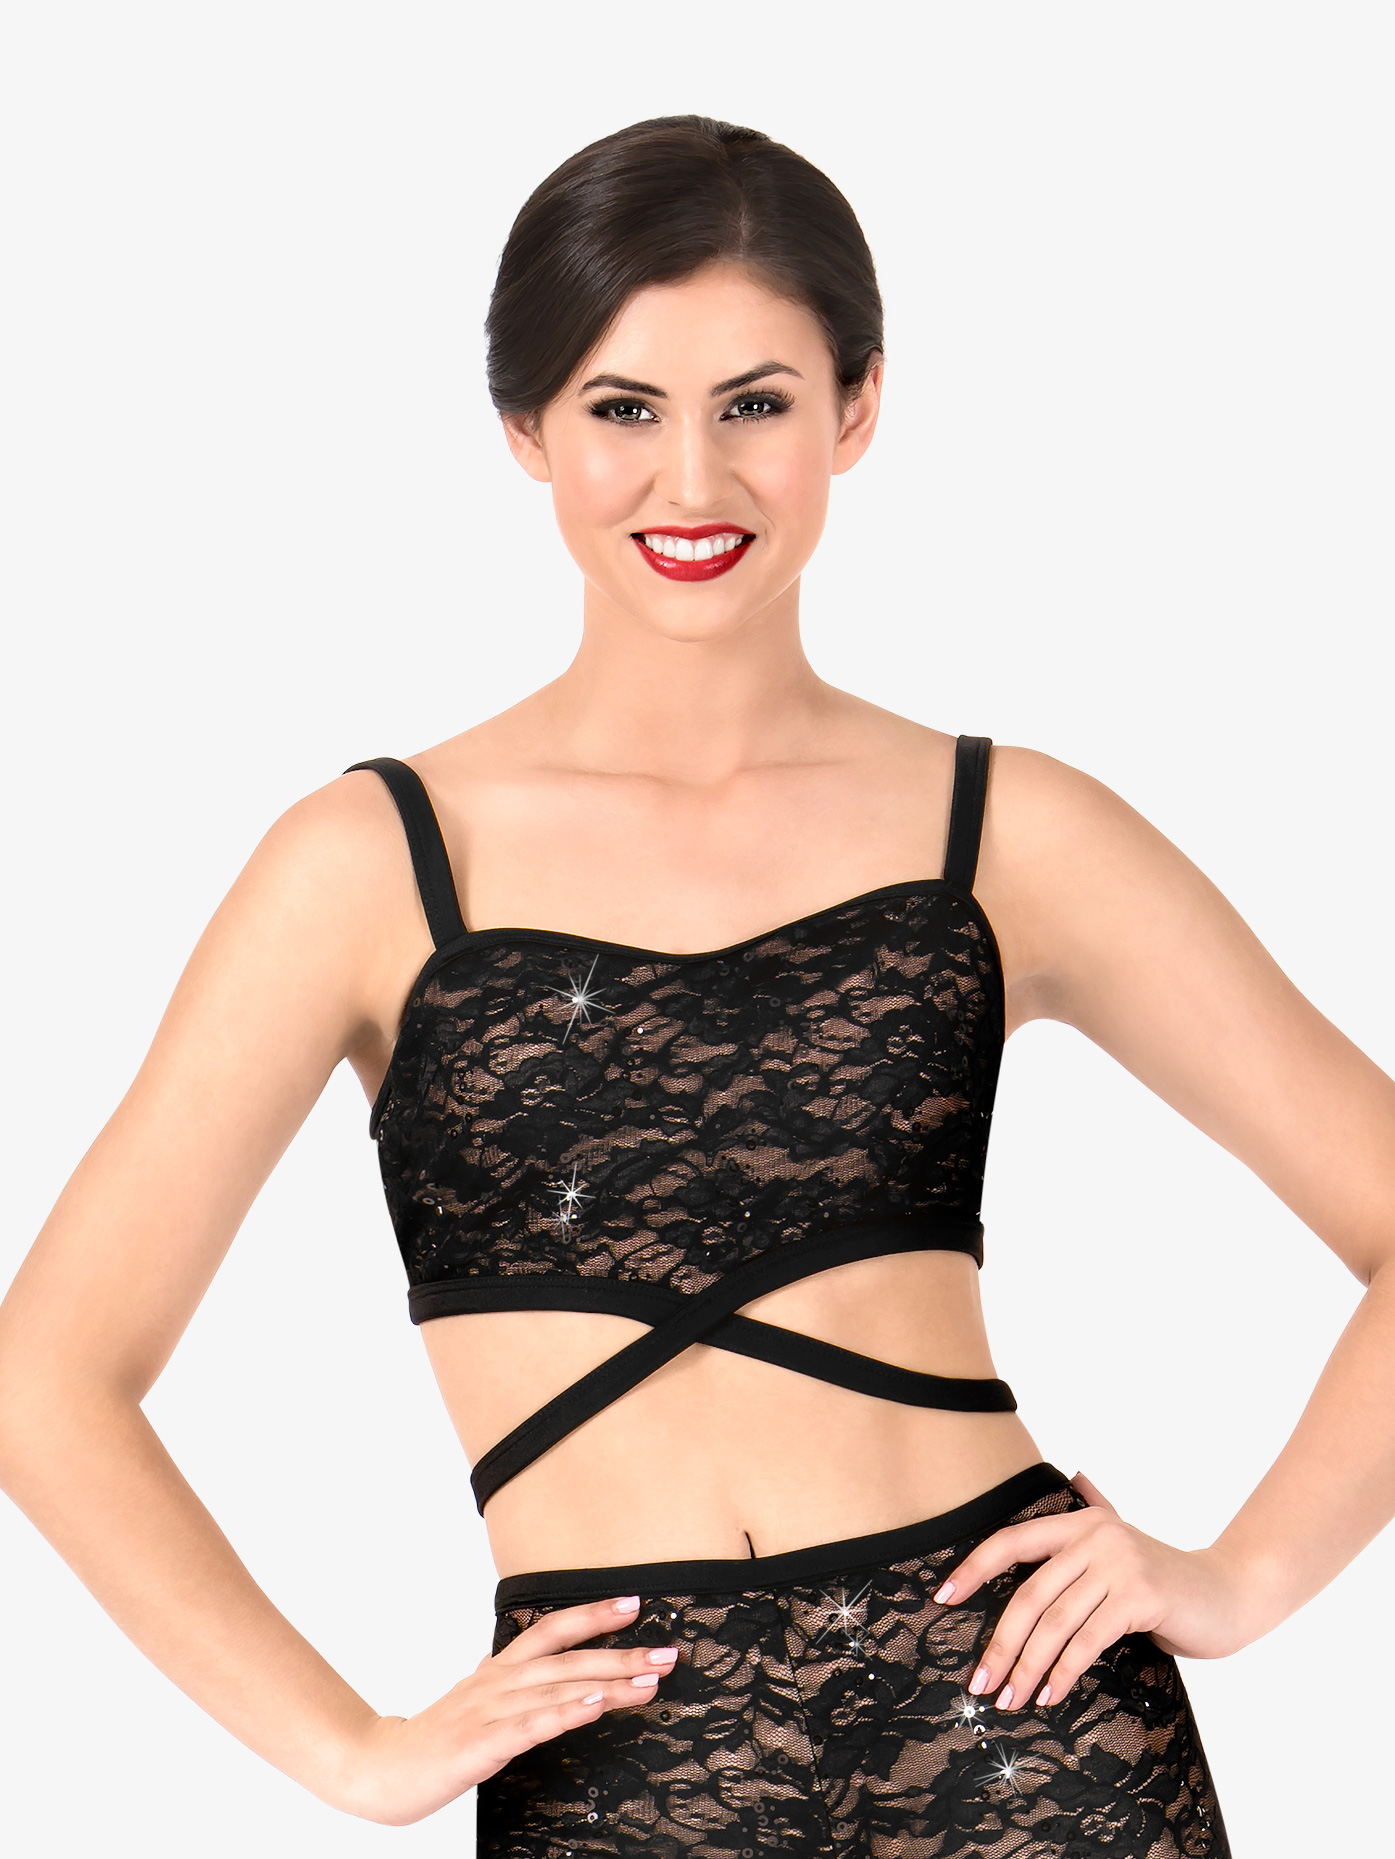 Elisse by Double Platinum Womens Crisscross Camisole Dance Bra Top N7488